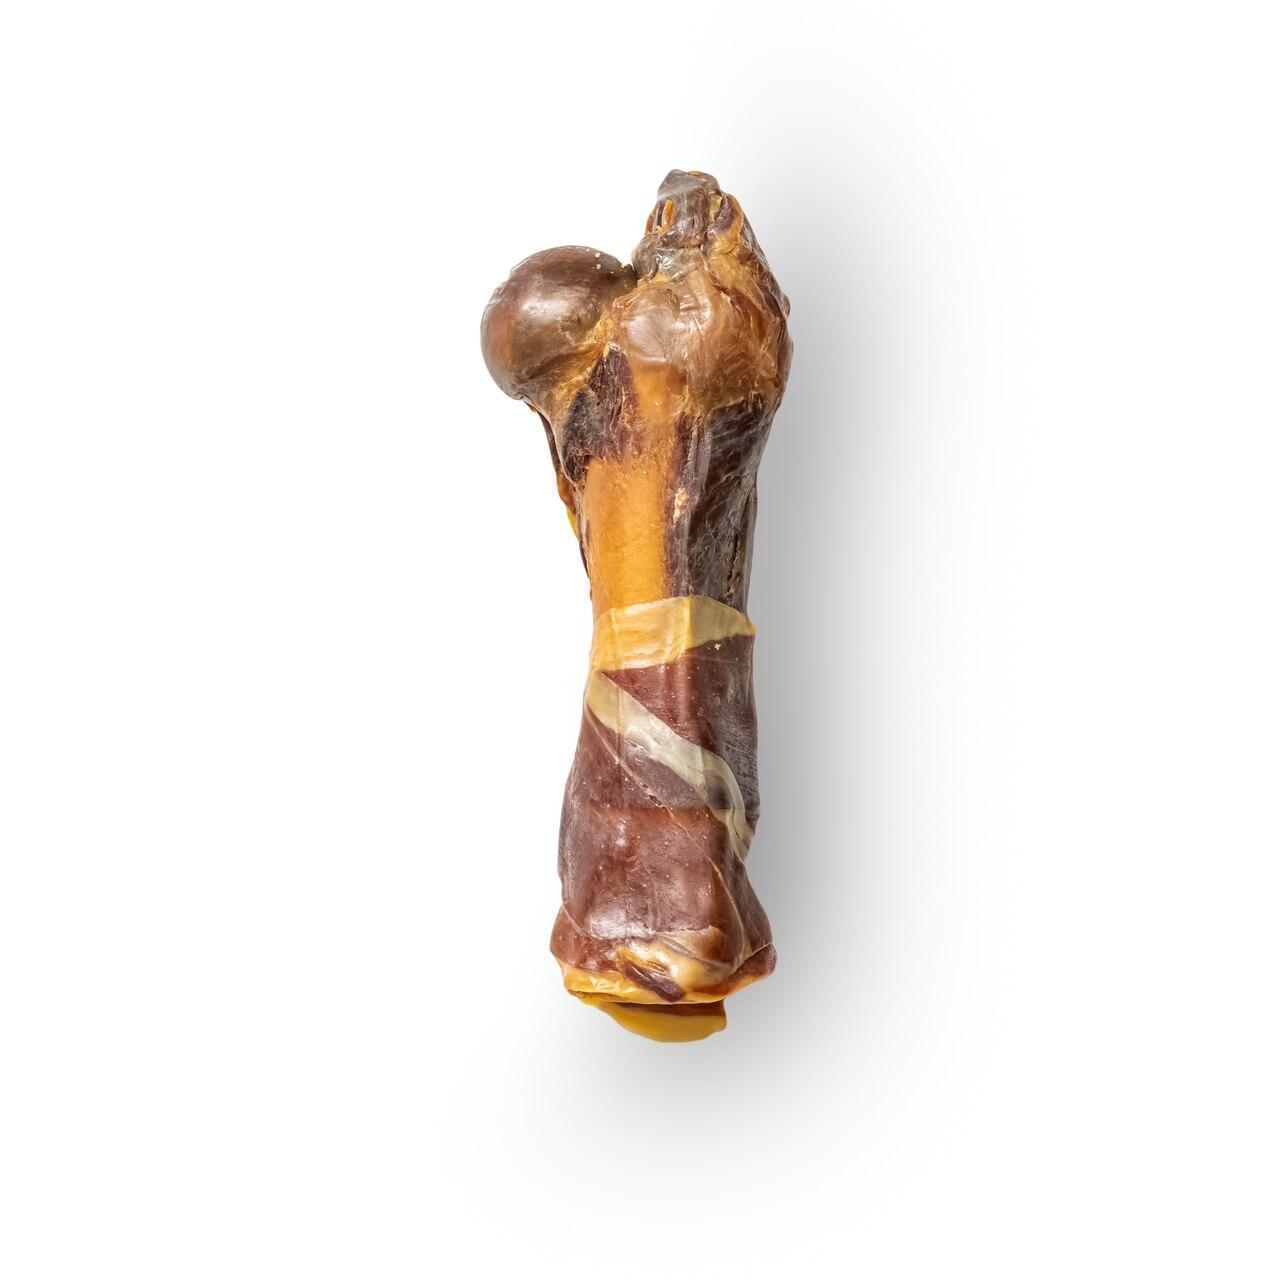 Half Ham Bone Serrano With Jamon | Tasty, Long Lasting, Single Ingredient, All-Natural Dog Chews |